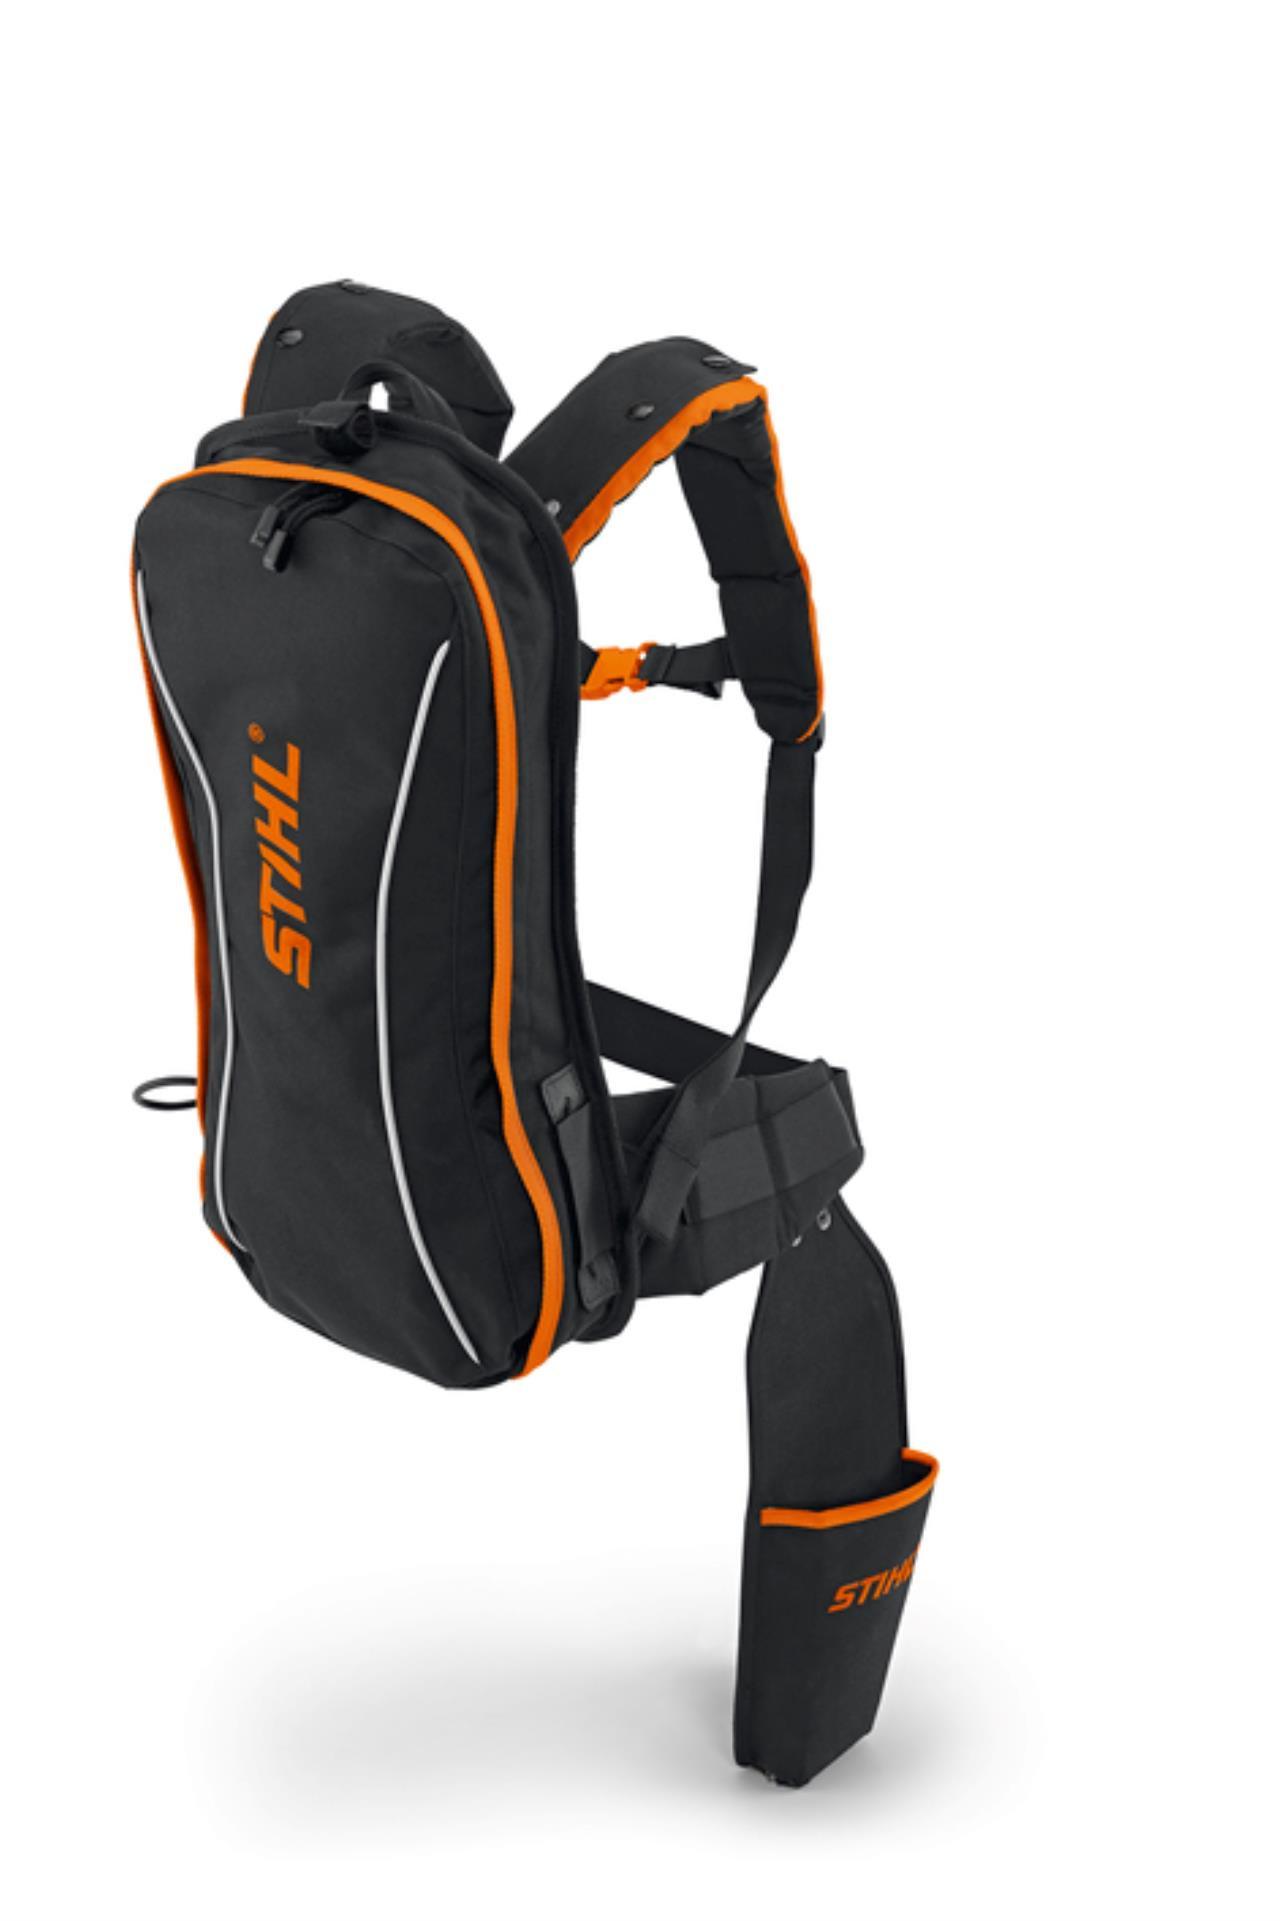 Stihl rygsæk til batteri